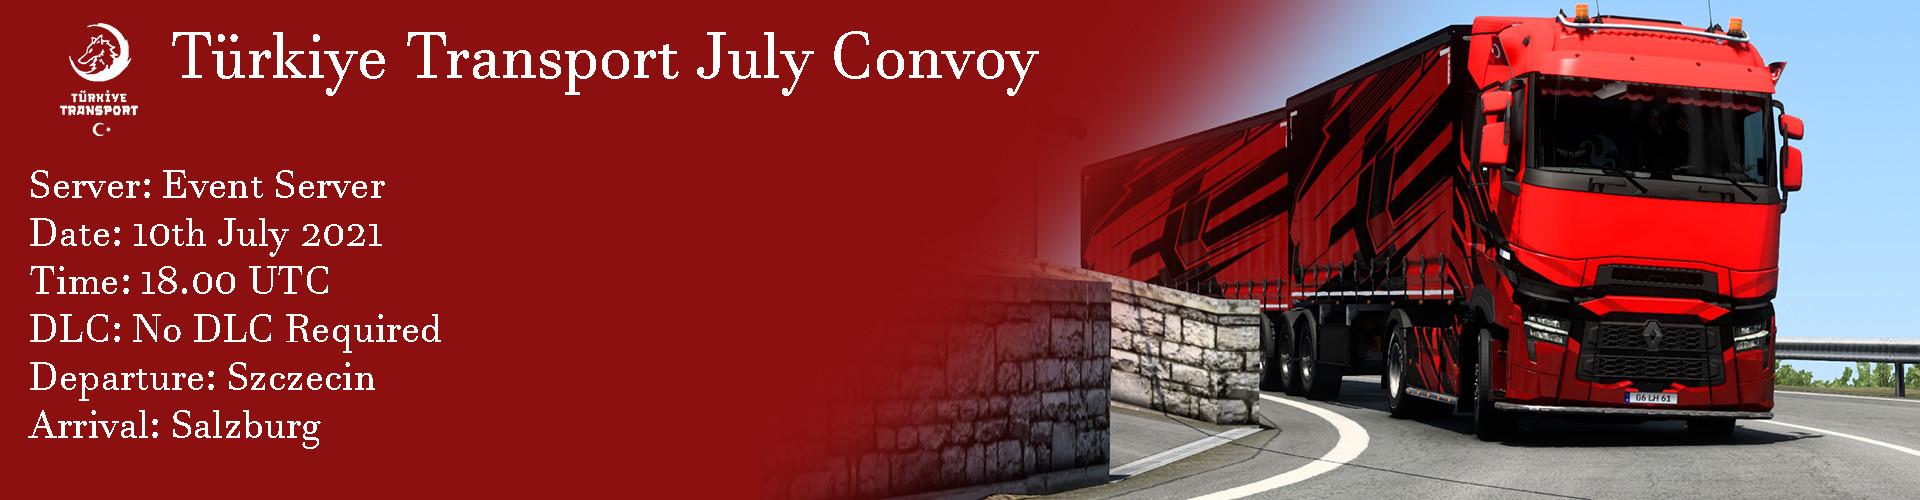 Türkiye Transport July Convoy